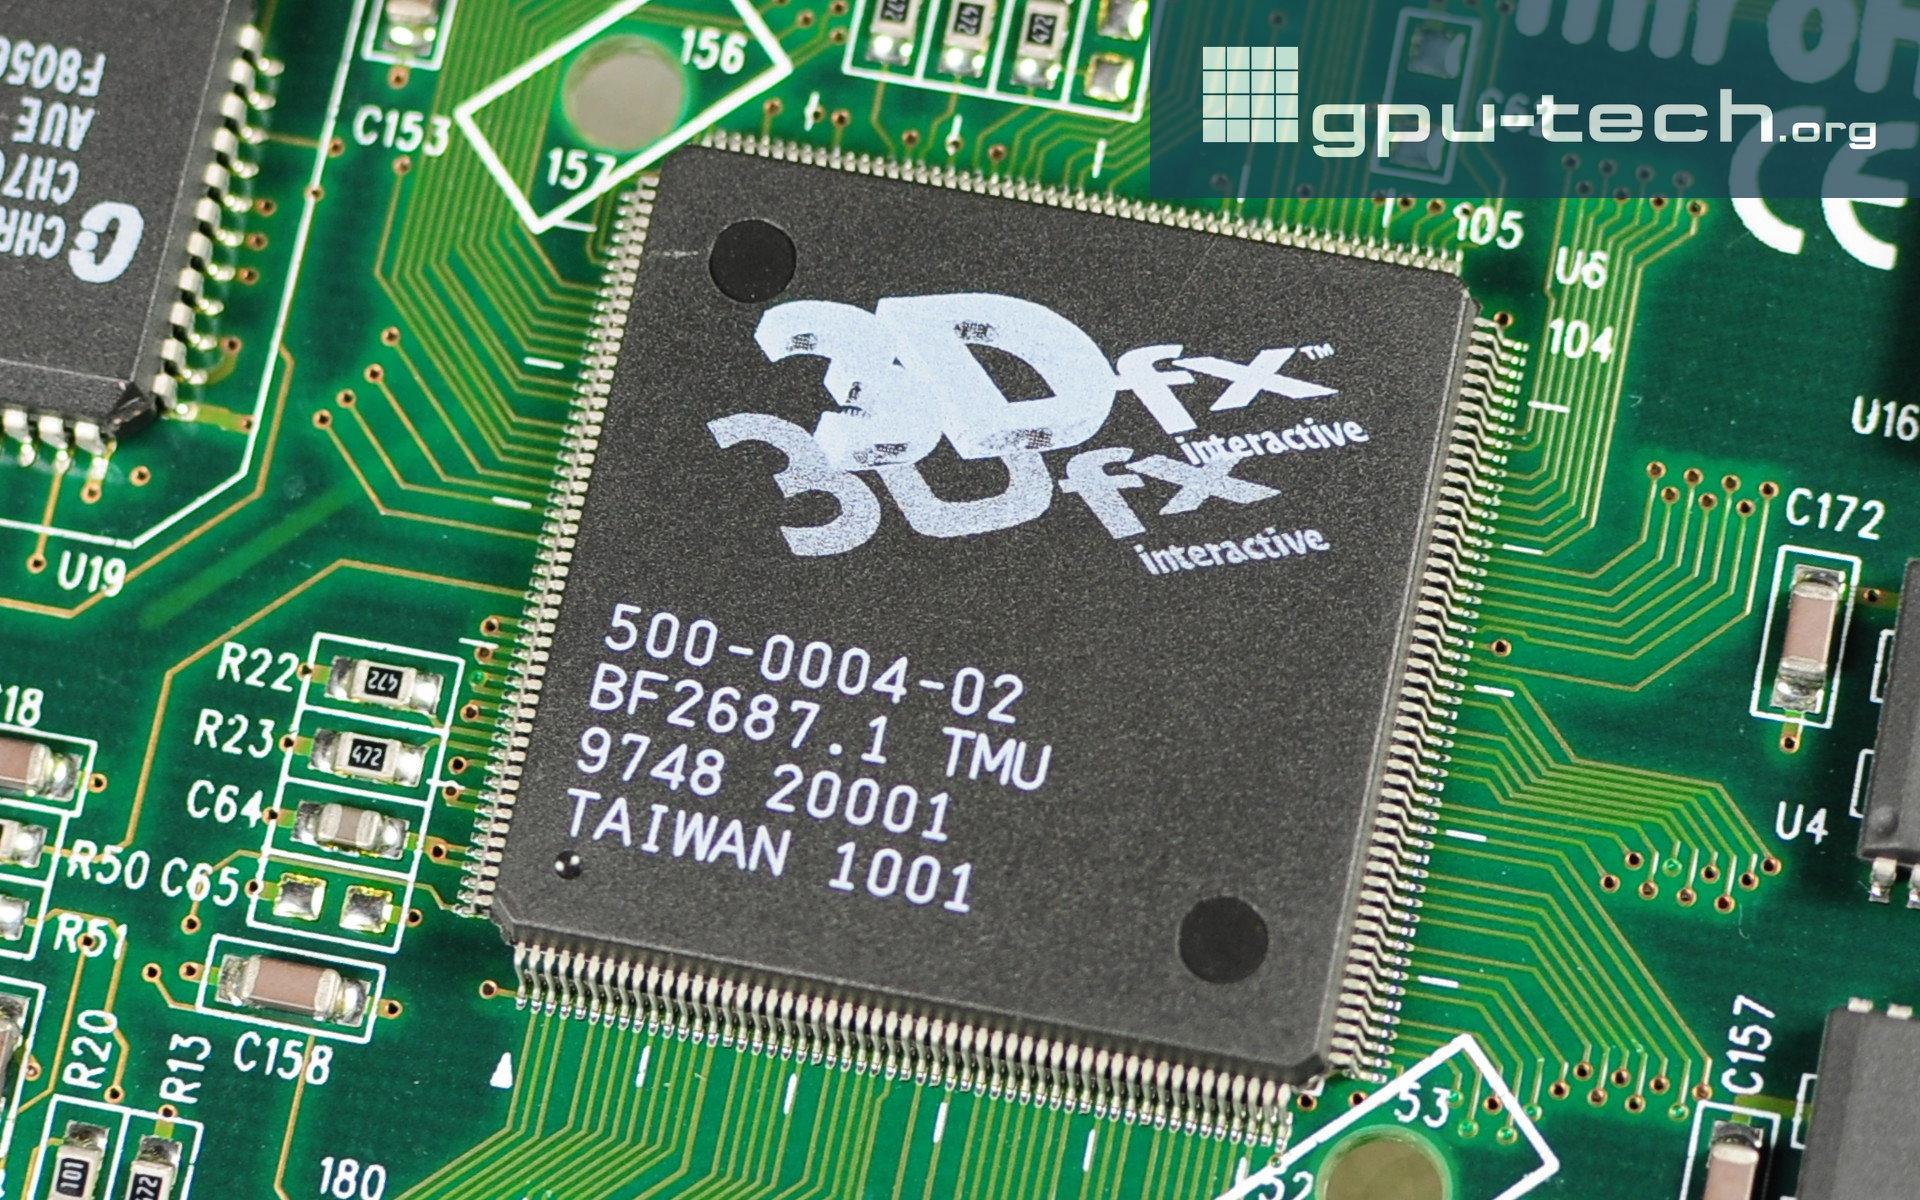 3dfx SST-1 TMU Chip